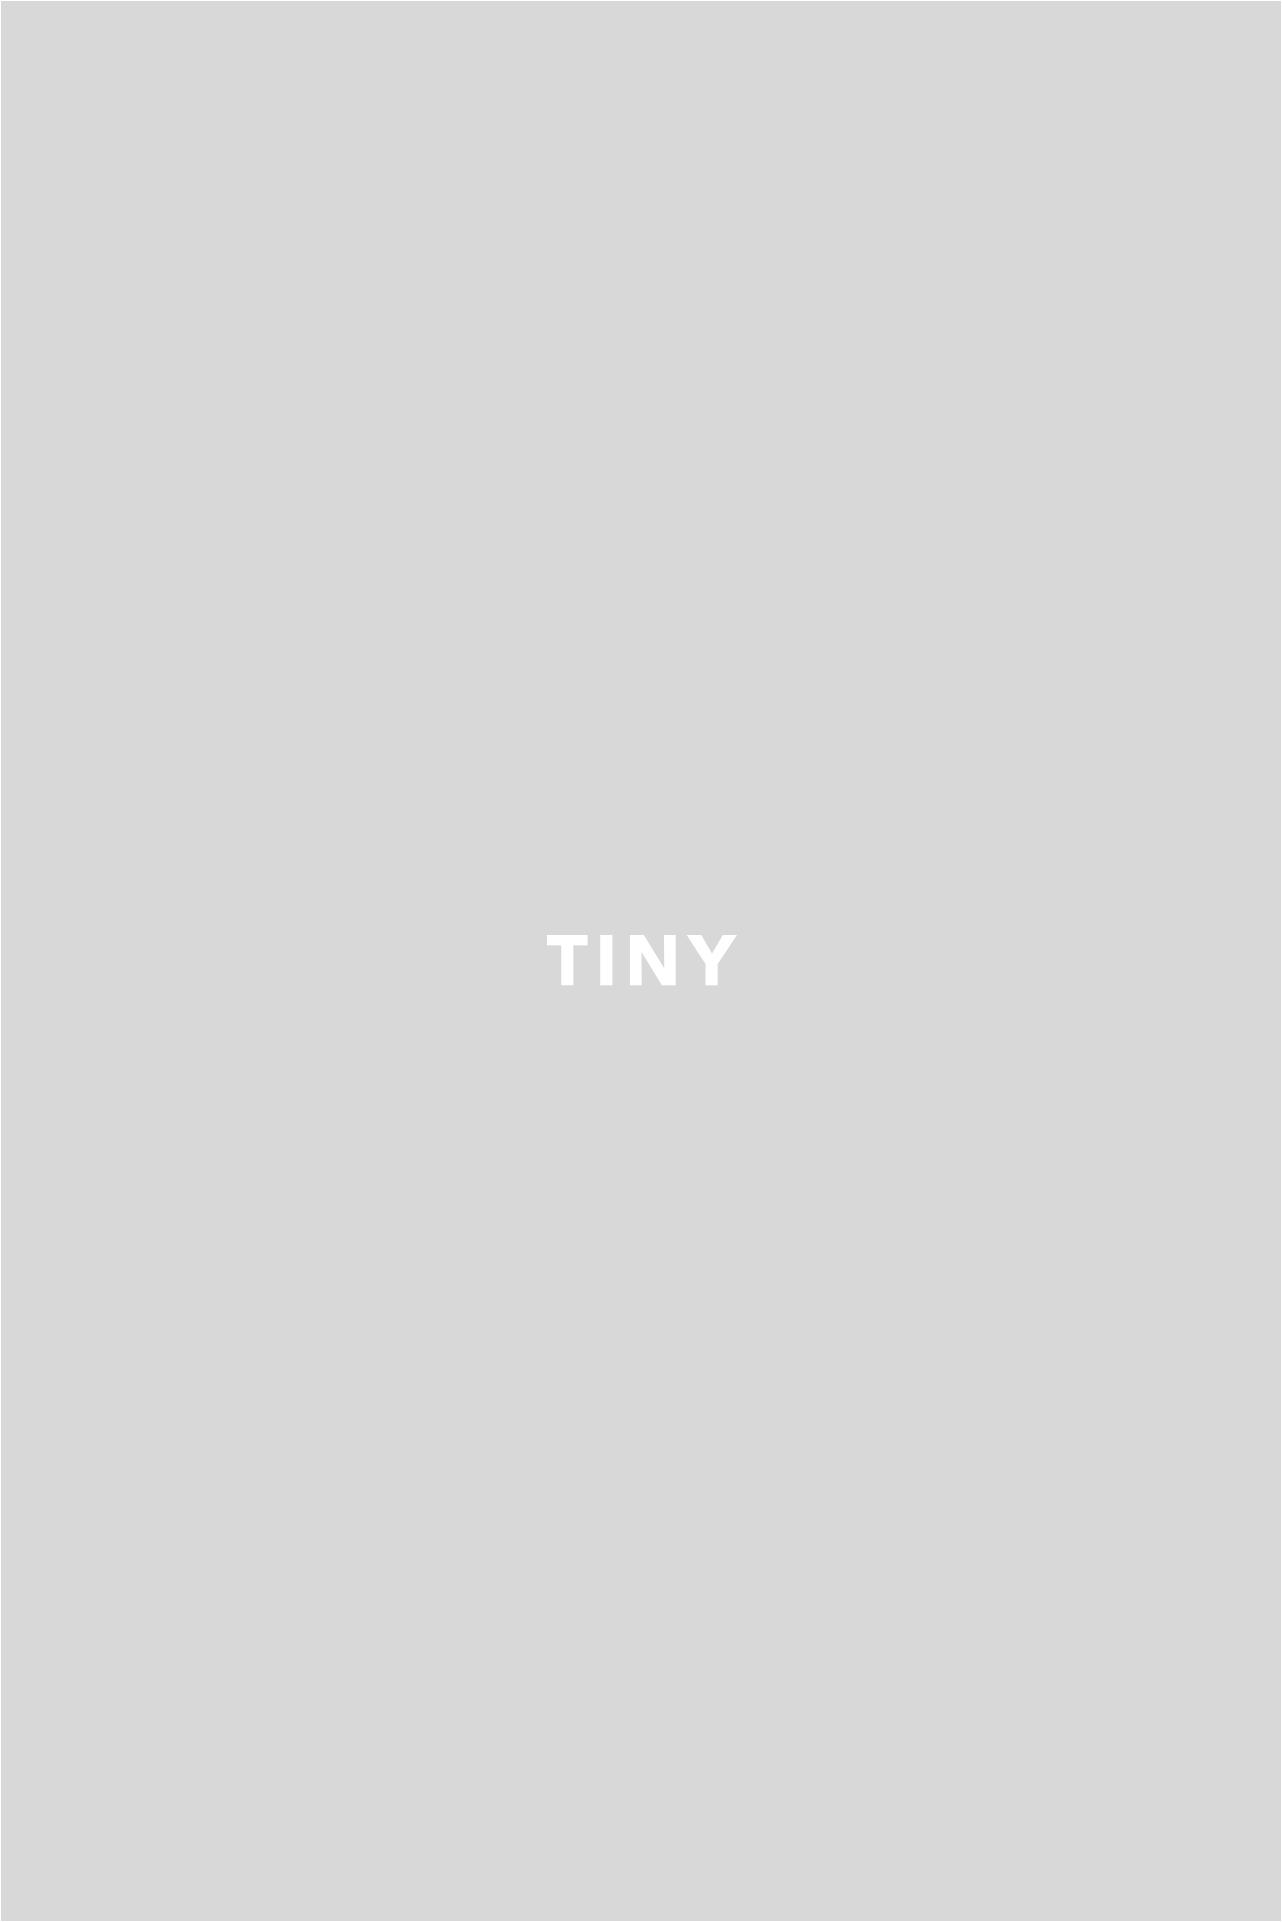 OMY - Coloring Poster - Ocean